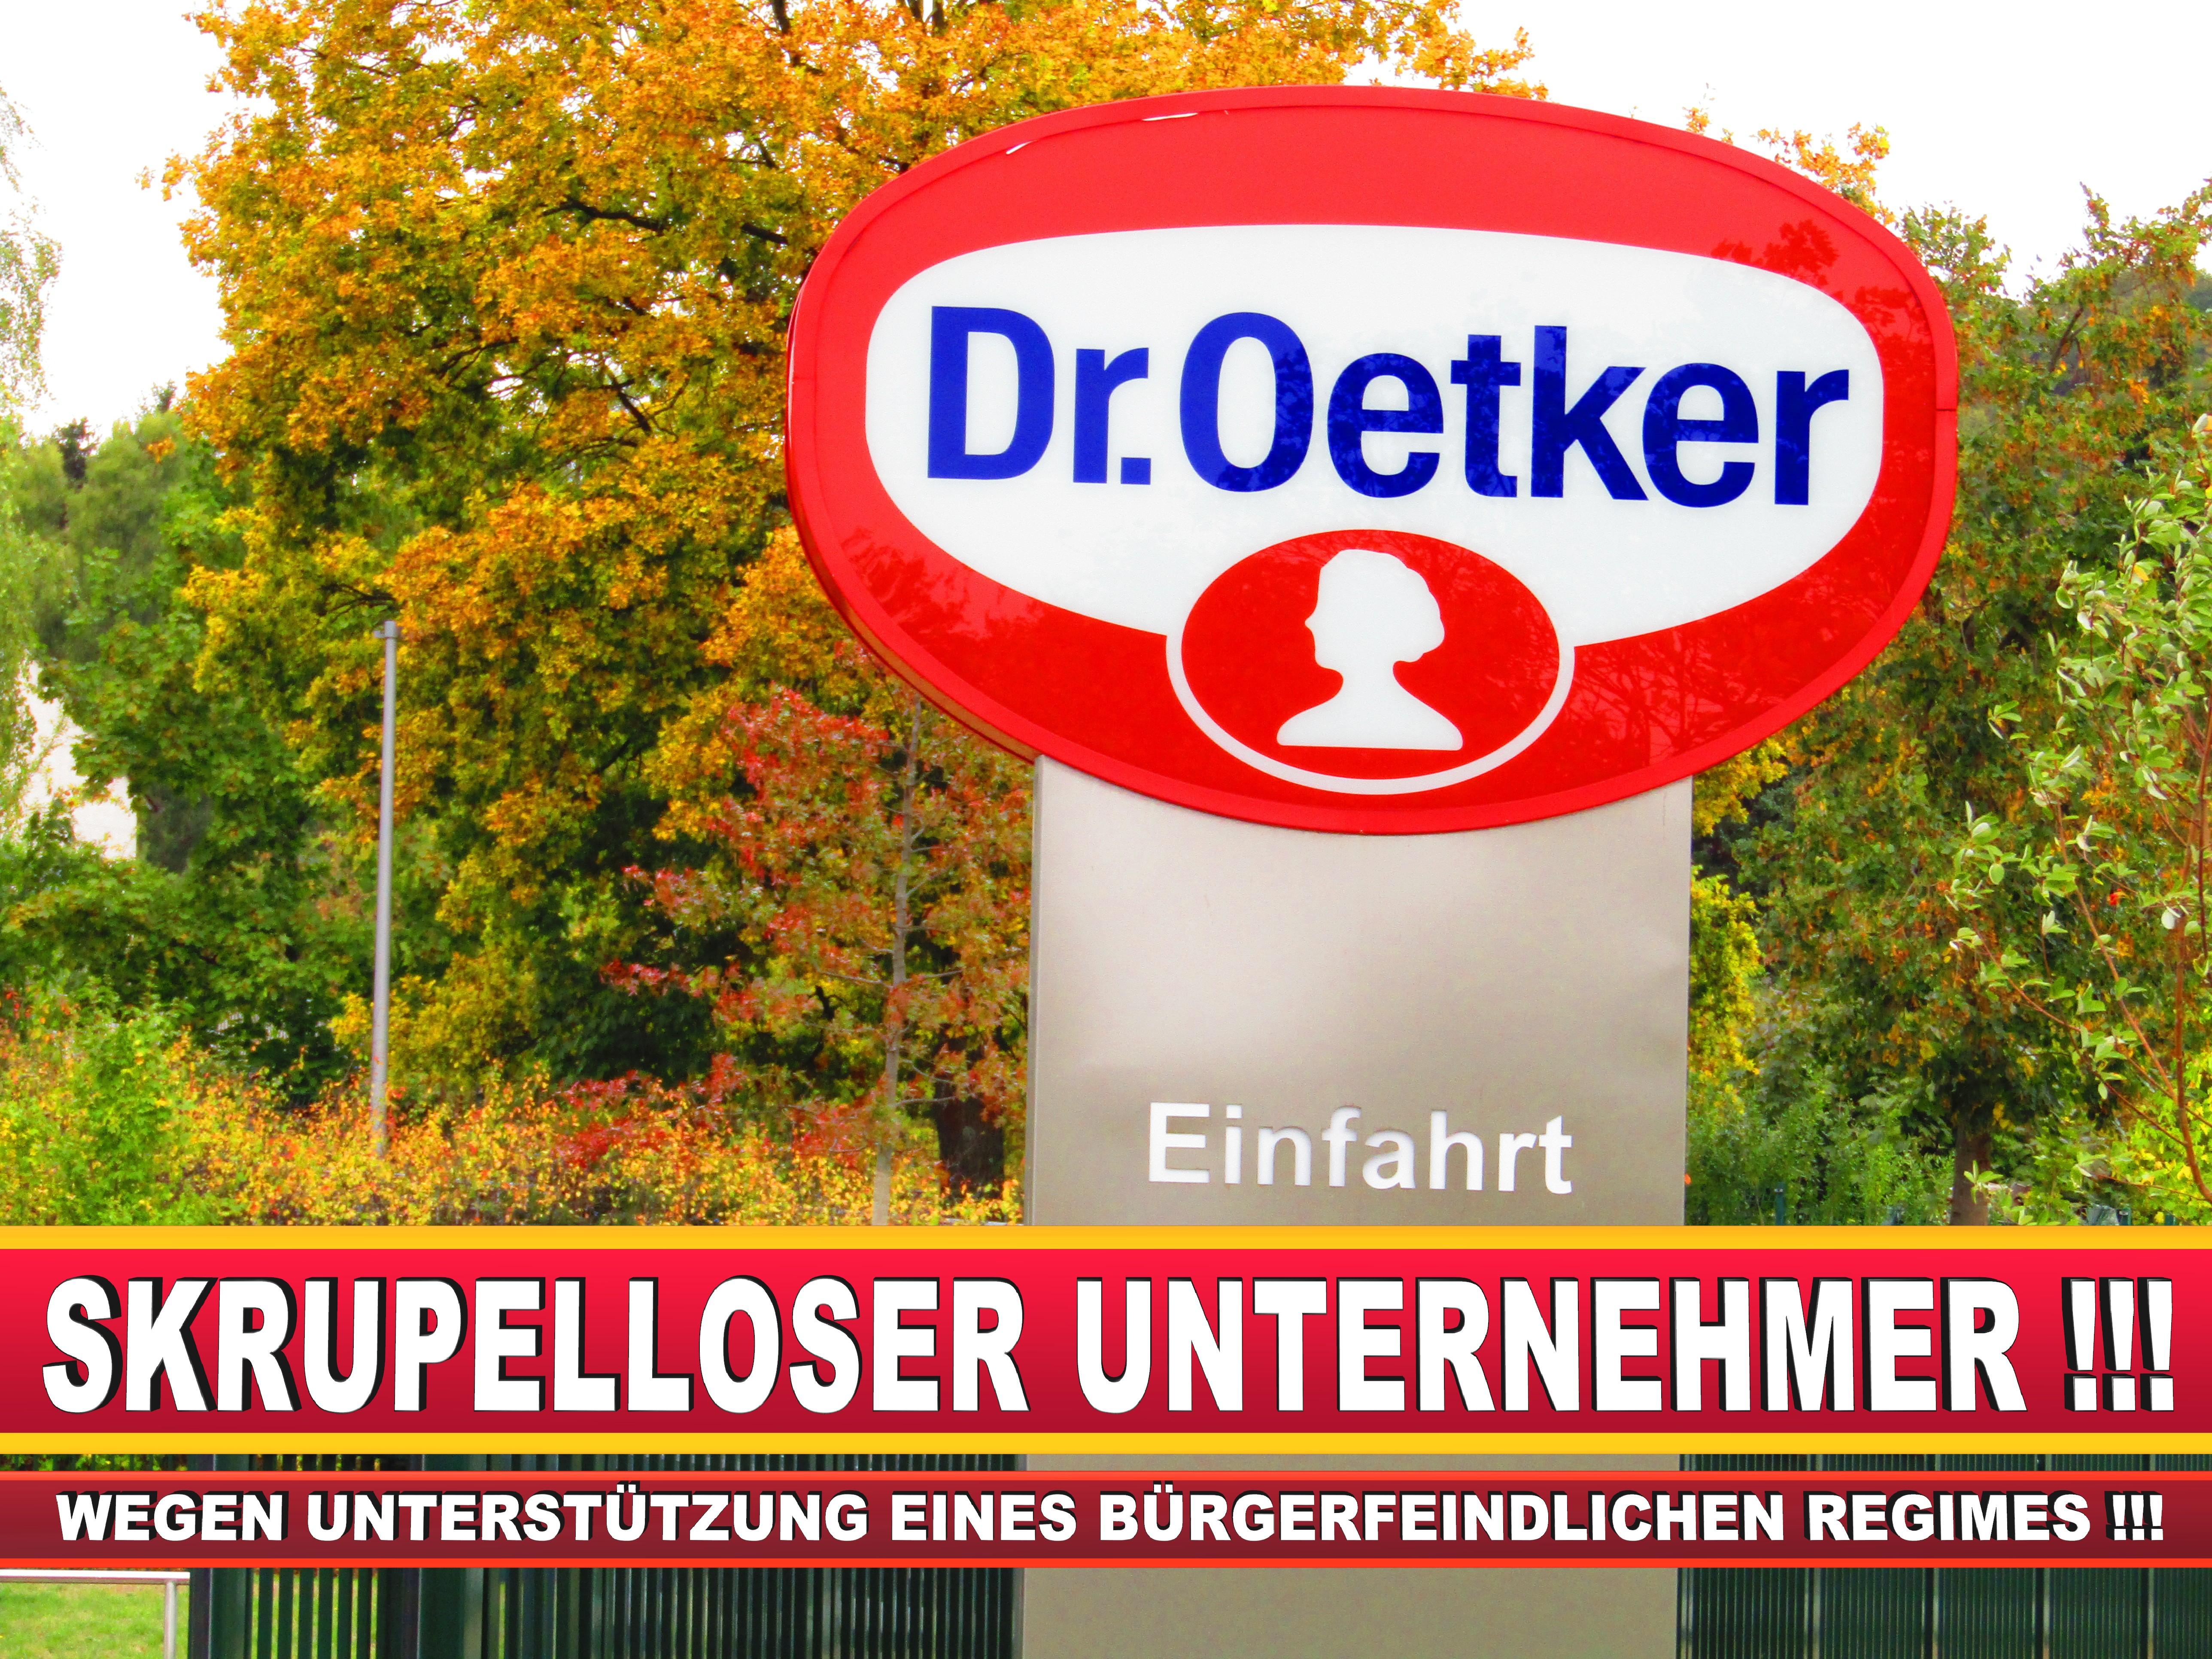 Dr Oetker Bielefeld CDU Bielefeld Spendengelder Skandal Richard August (10)